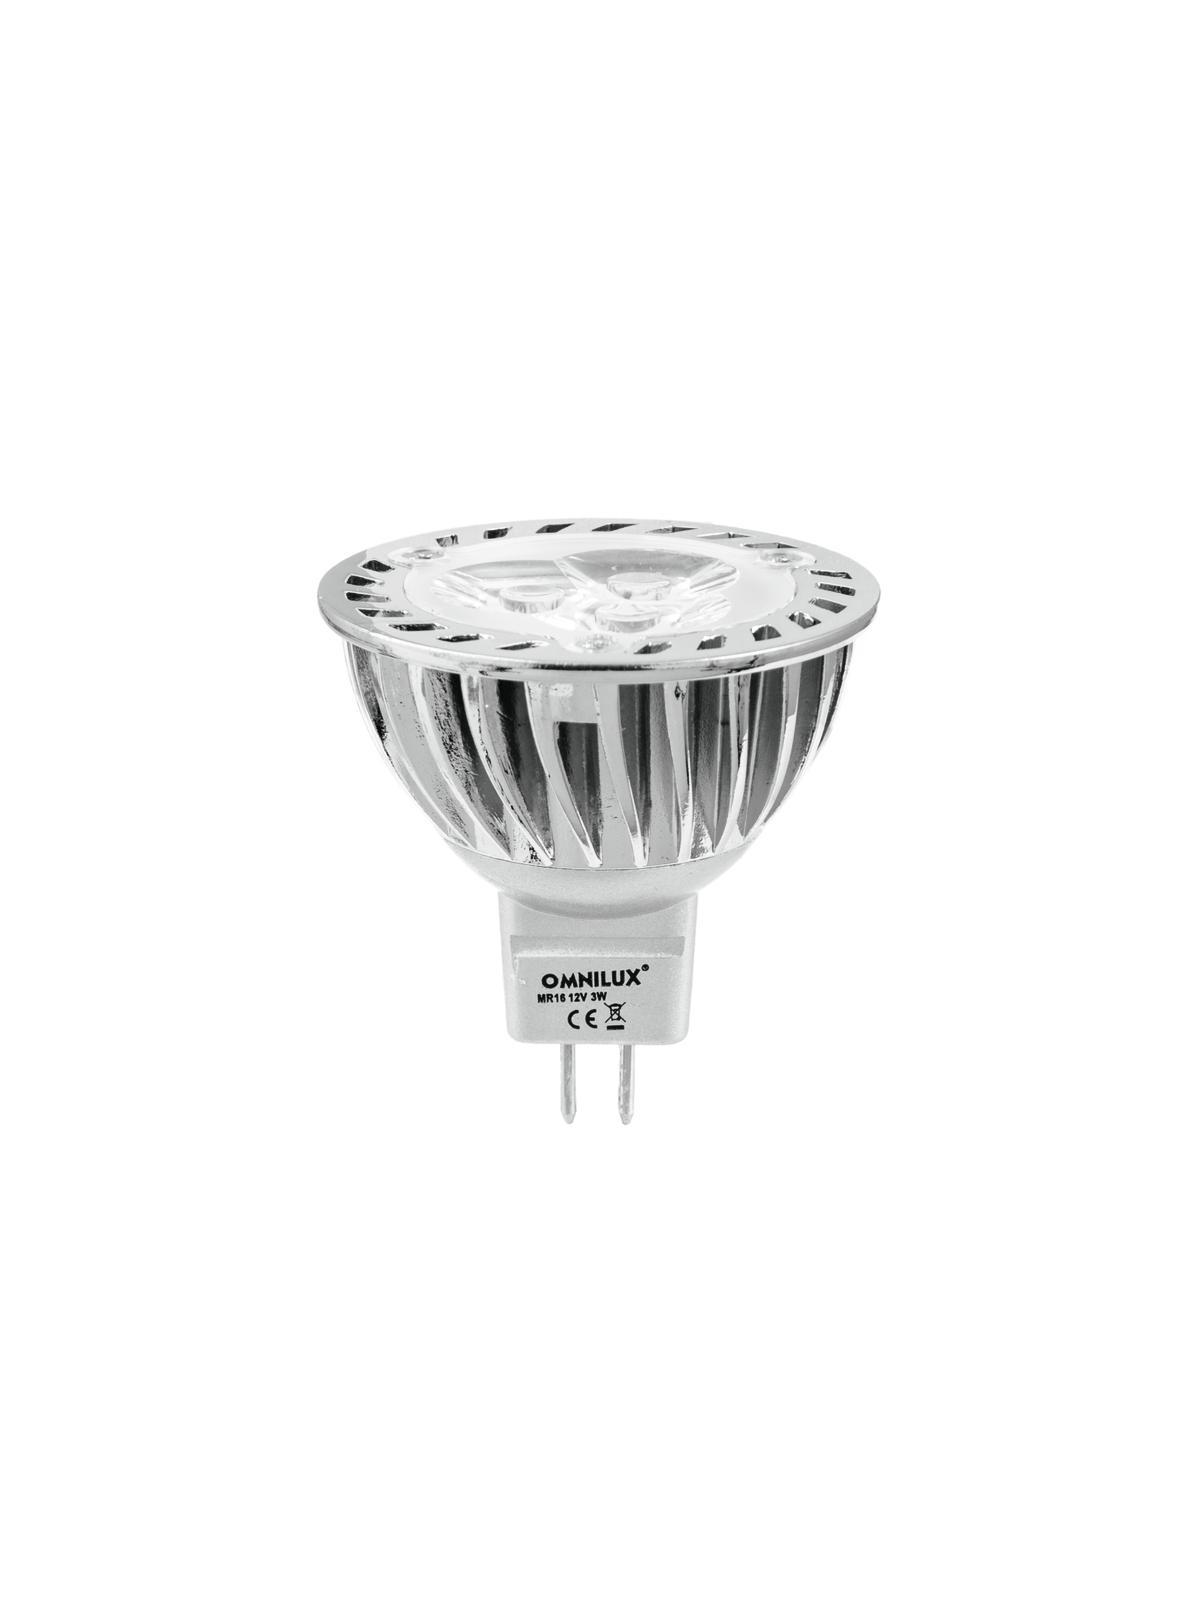 Lampada a led GU-5.3 12V 3x1W LED 3000K OMNILUX